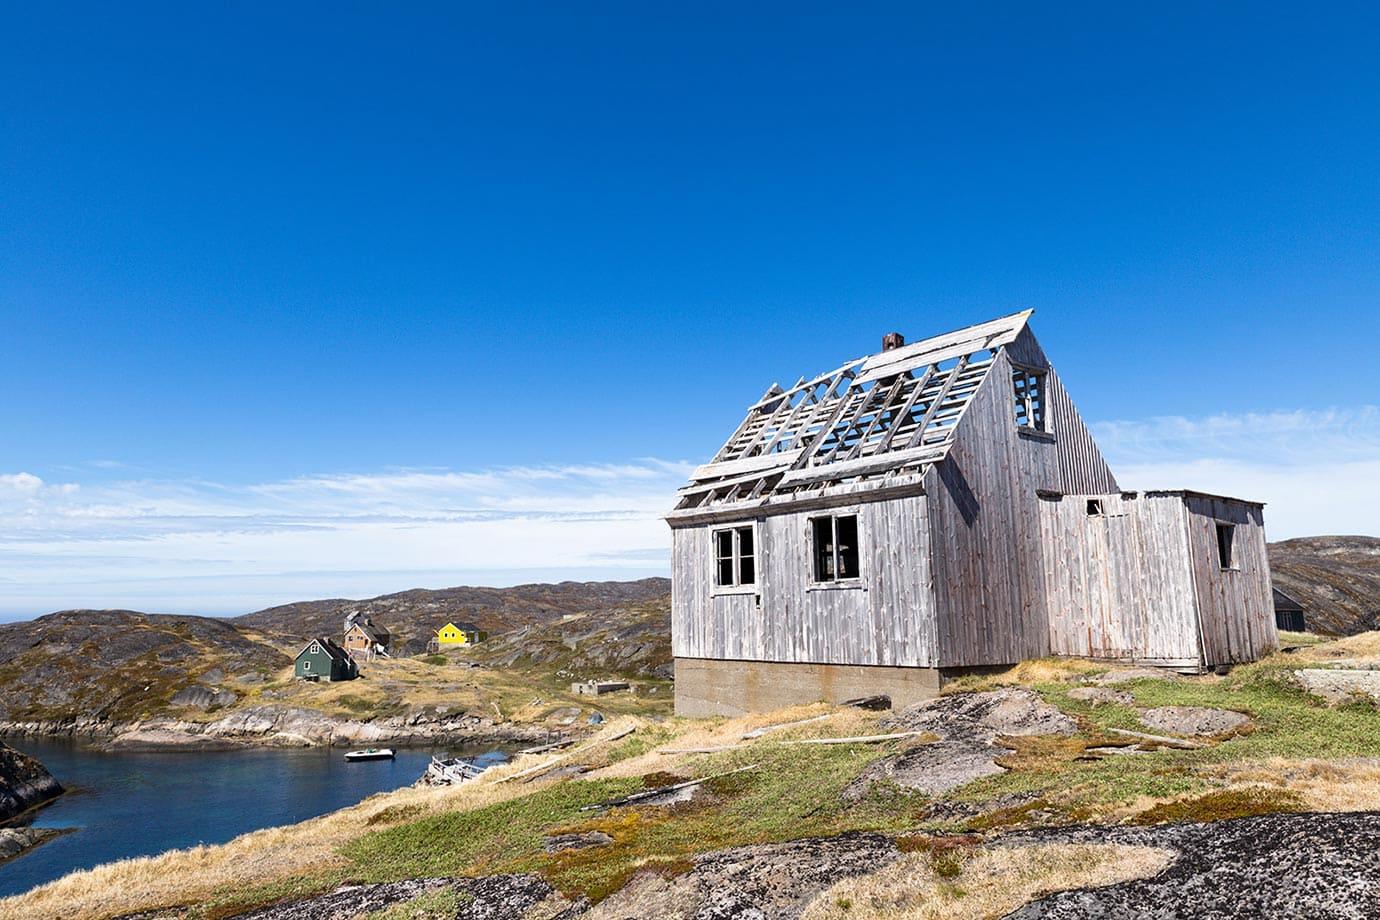 Kangeq, Greenland